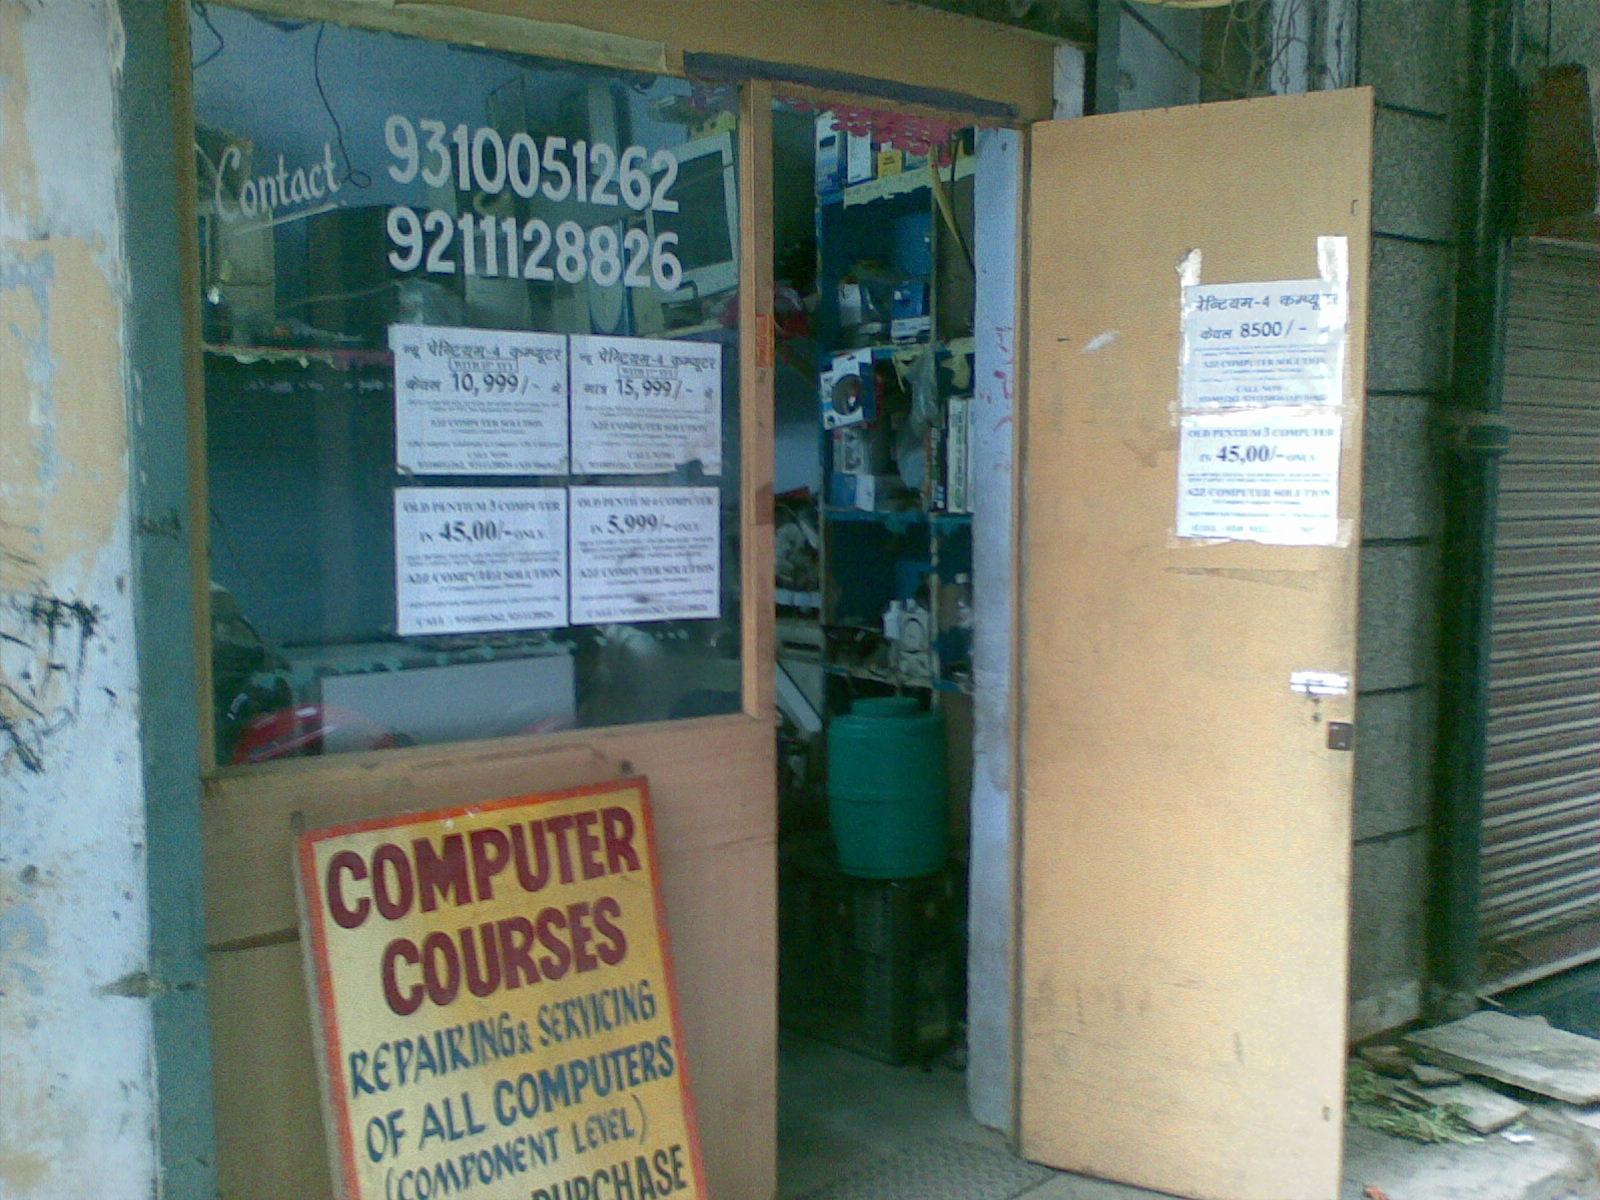 A2Z COMPUTER SOLUTION IN PASCHIM VIHAR, JWALA HERI MARKET, MATKE WALI GALI